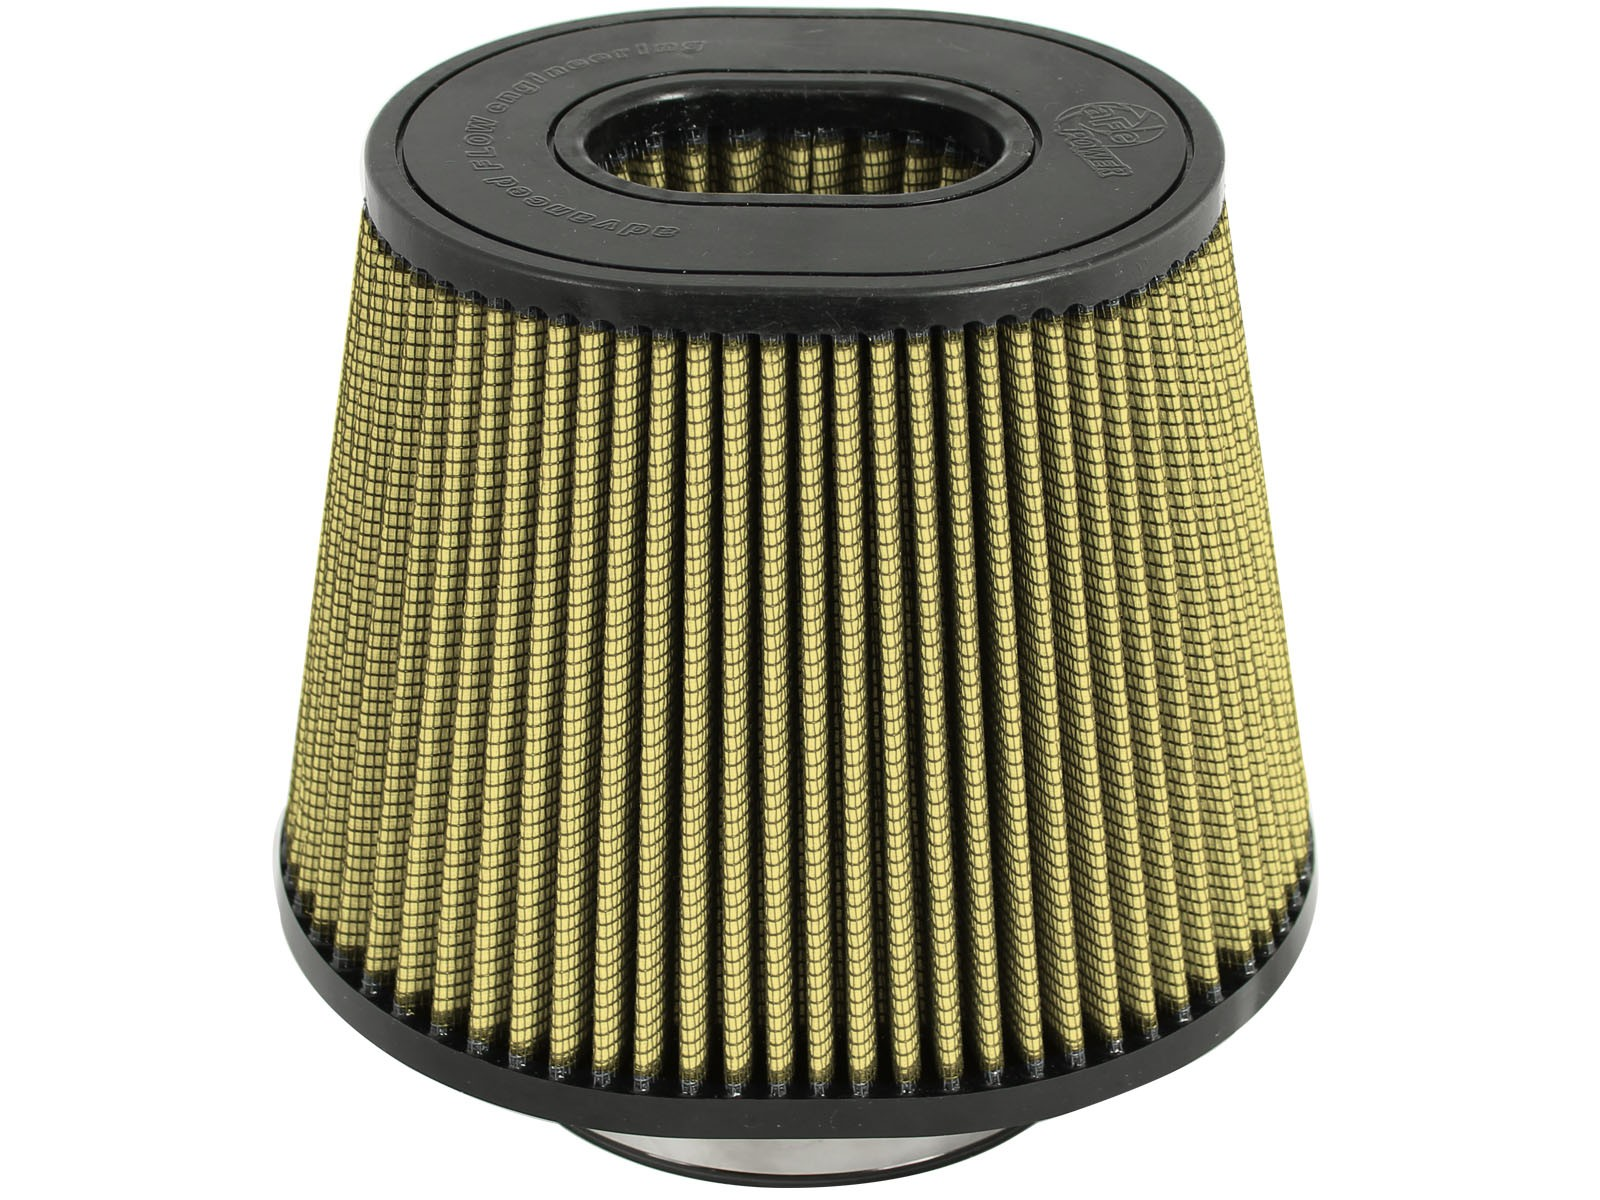 aFe POWER 72-91064 Magnum FLOW Pro GUARD7 Air Filter